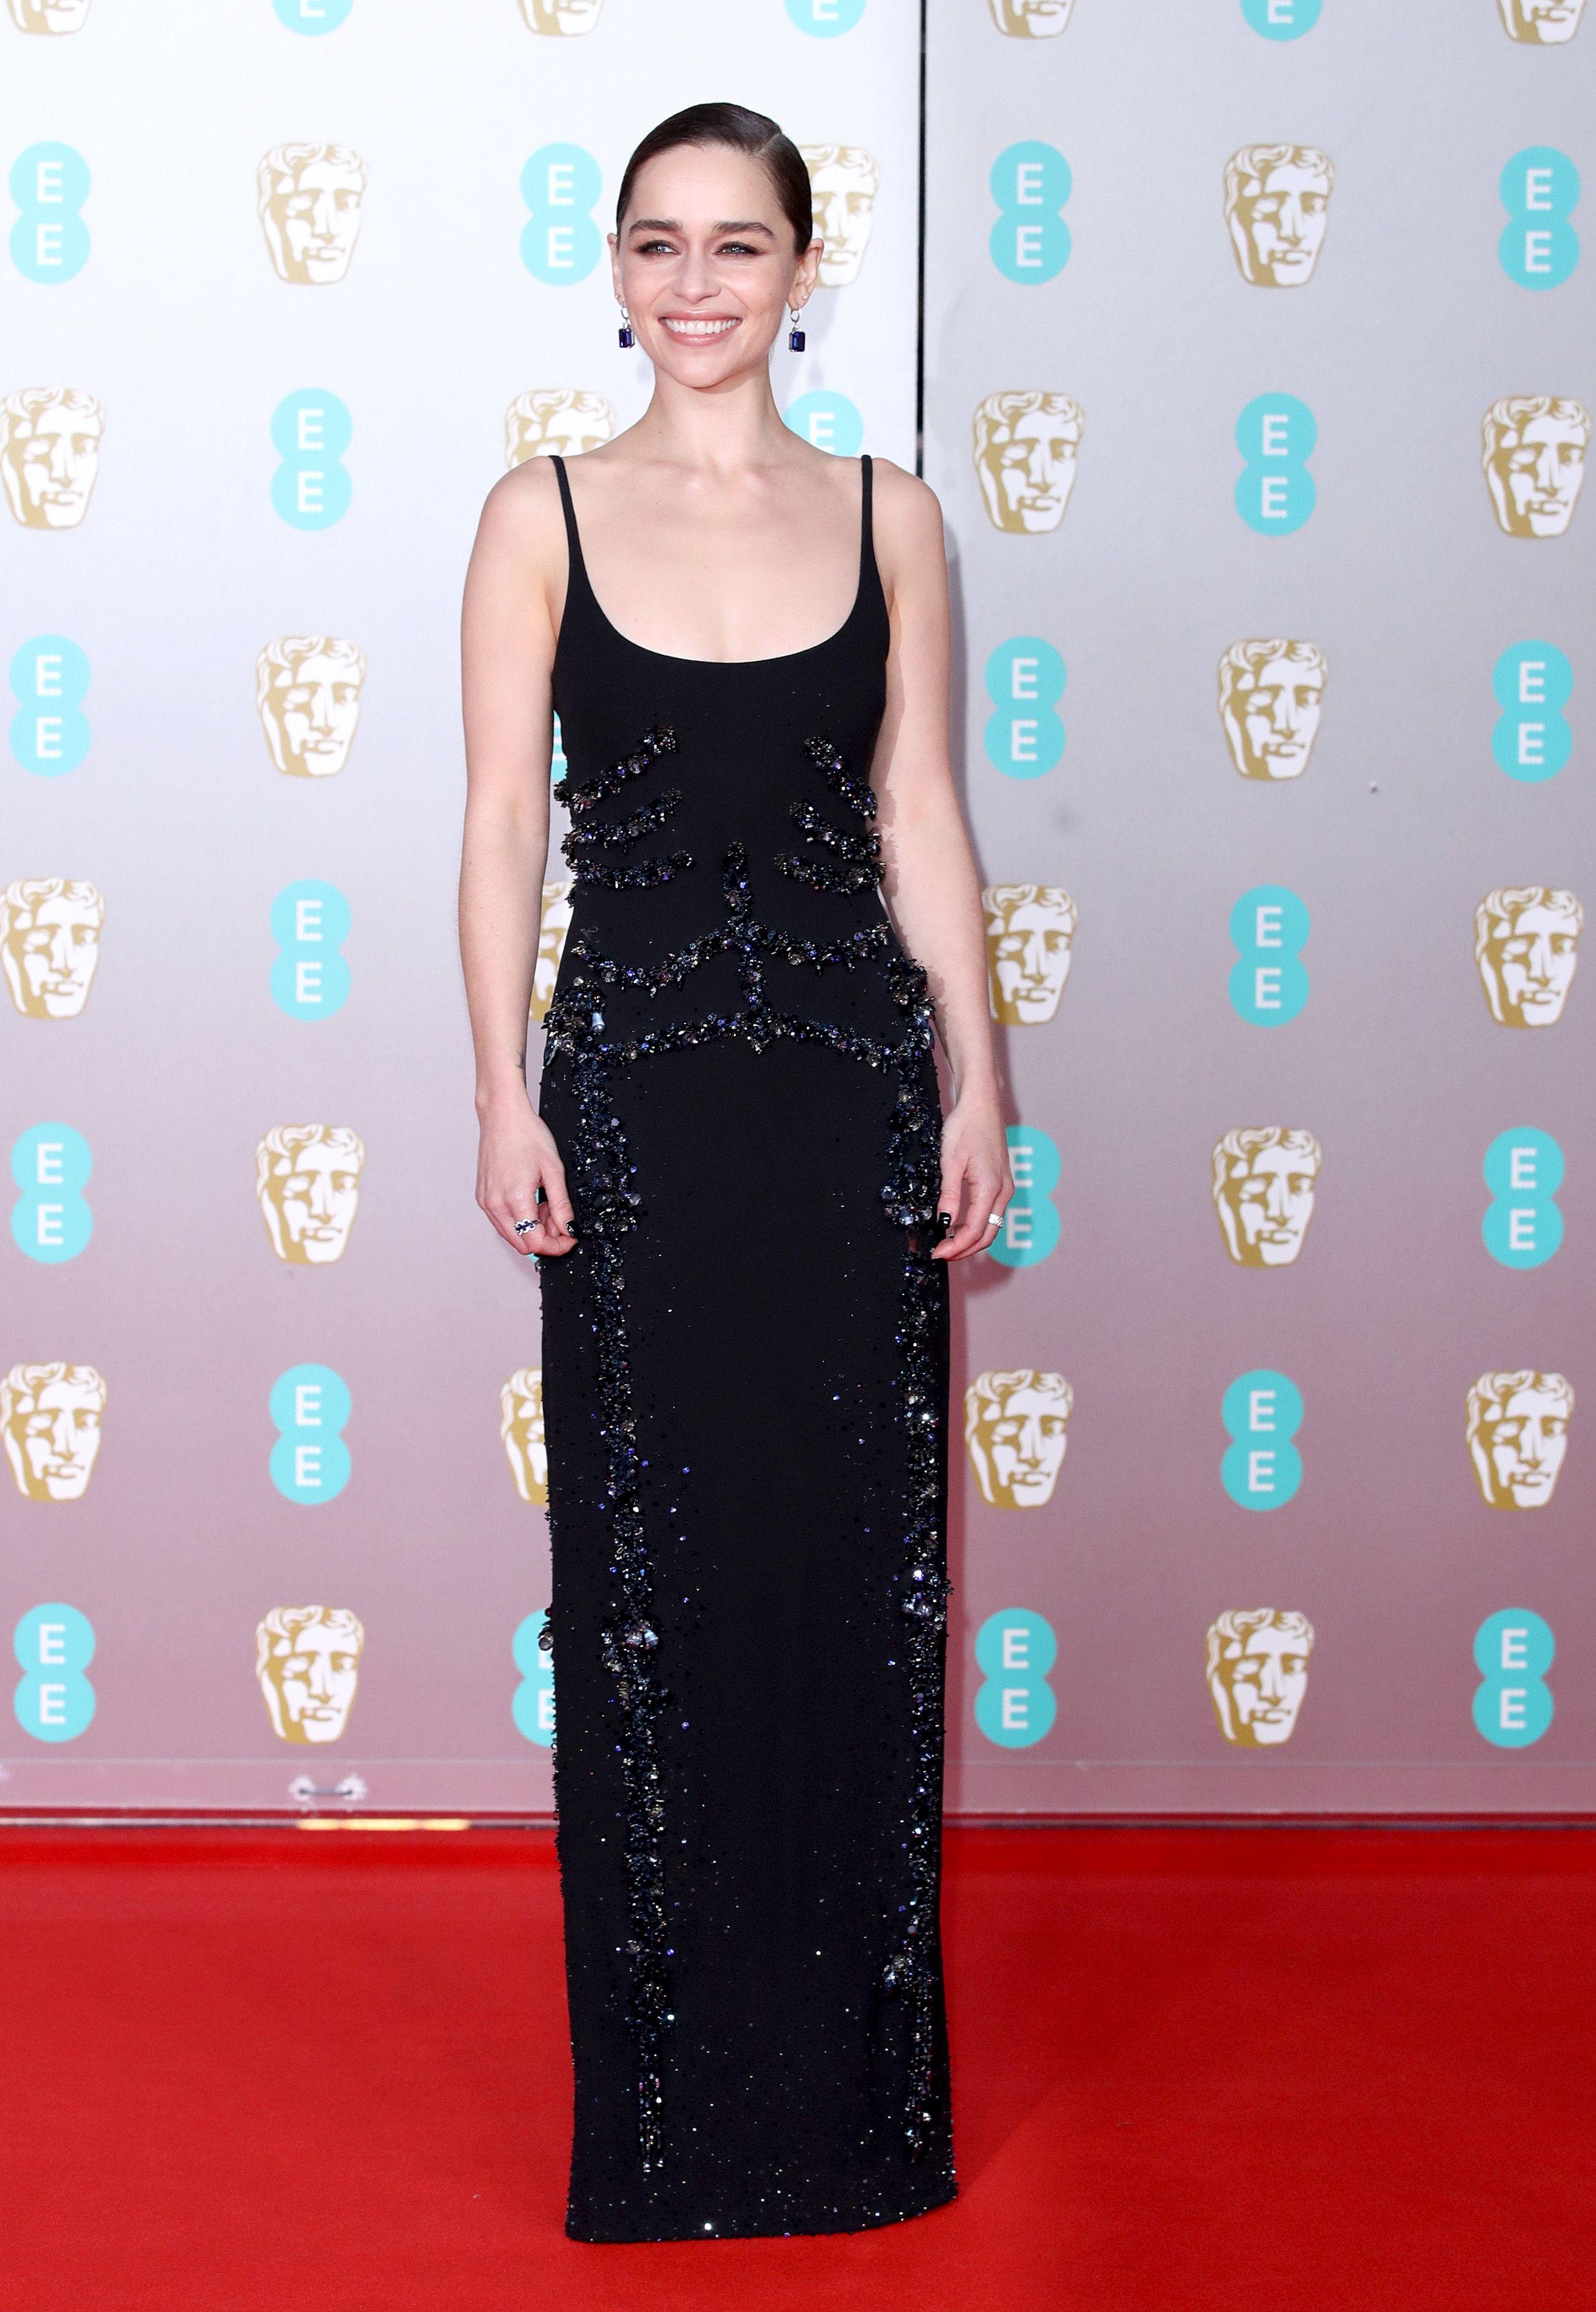 Emilia Clarke Stuns in a Slinky Black Dress on the BAFTA Red Carpet